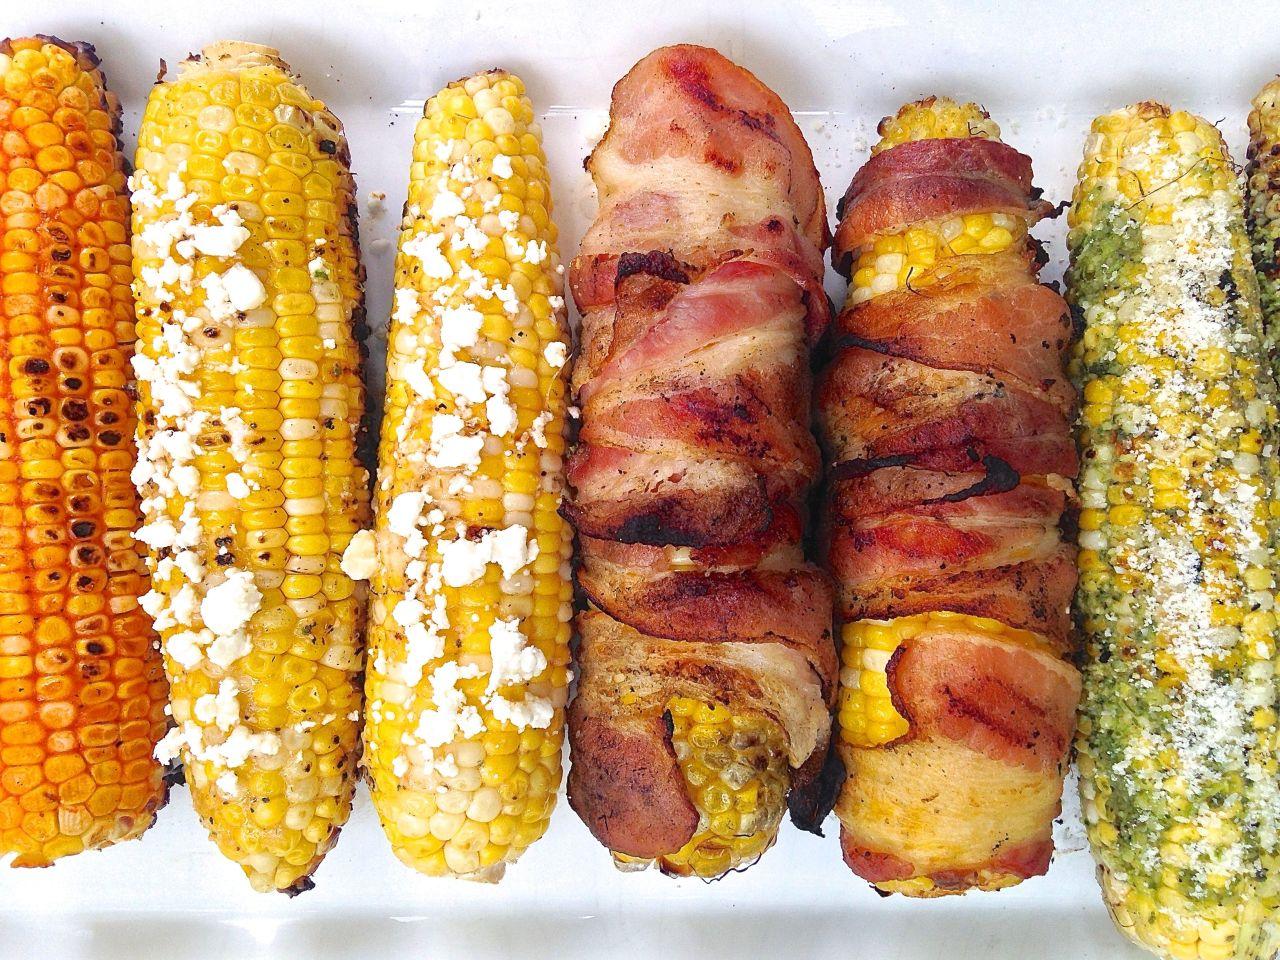 more corn-group-delish.jpg